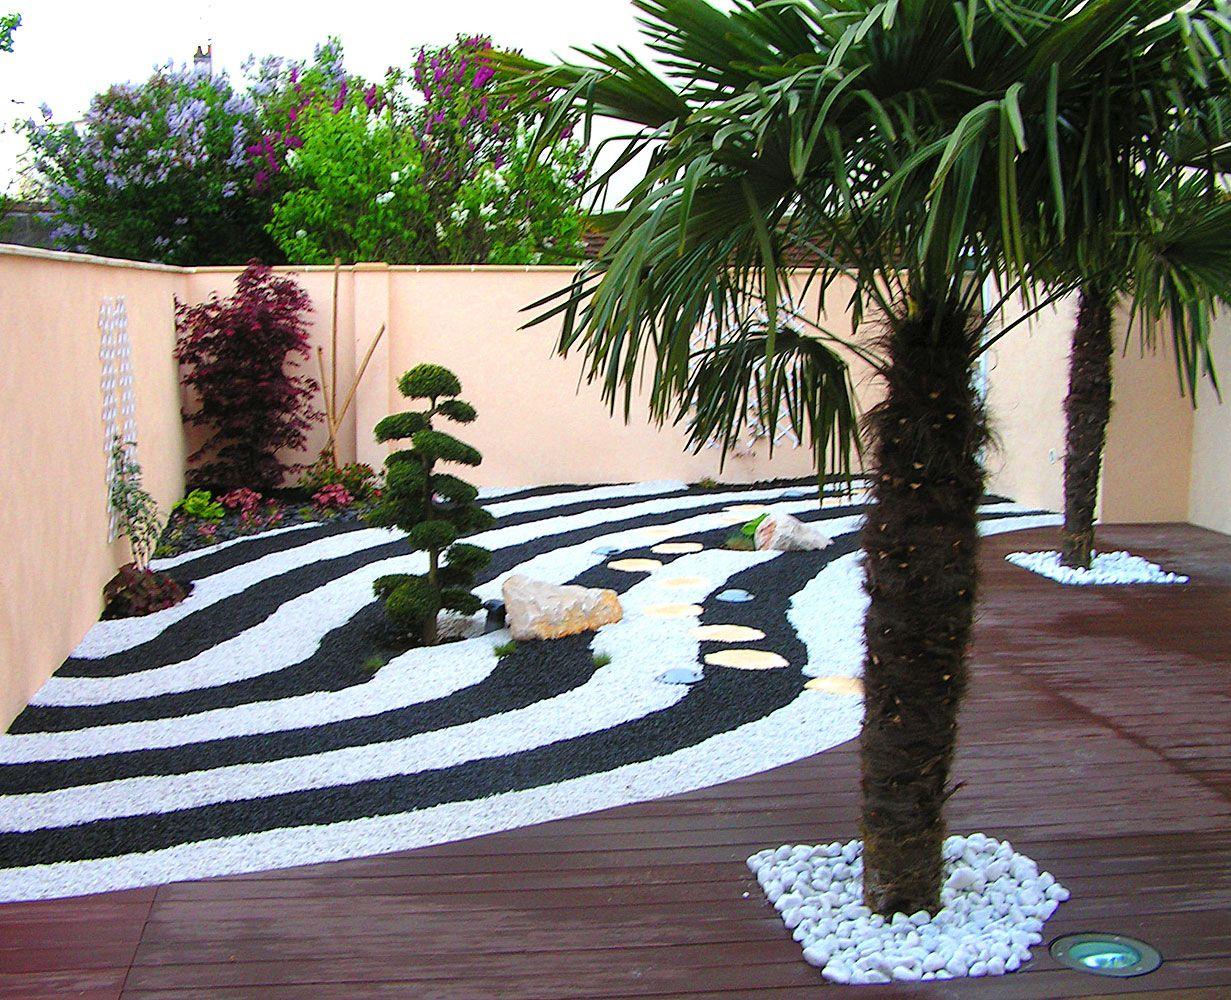 Jardin Zen Et Japonais Dijon | Design Paysage | Jardin Zen ... tout Idee Amenagement Jardin Zen